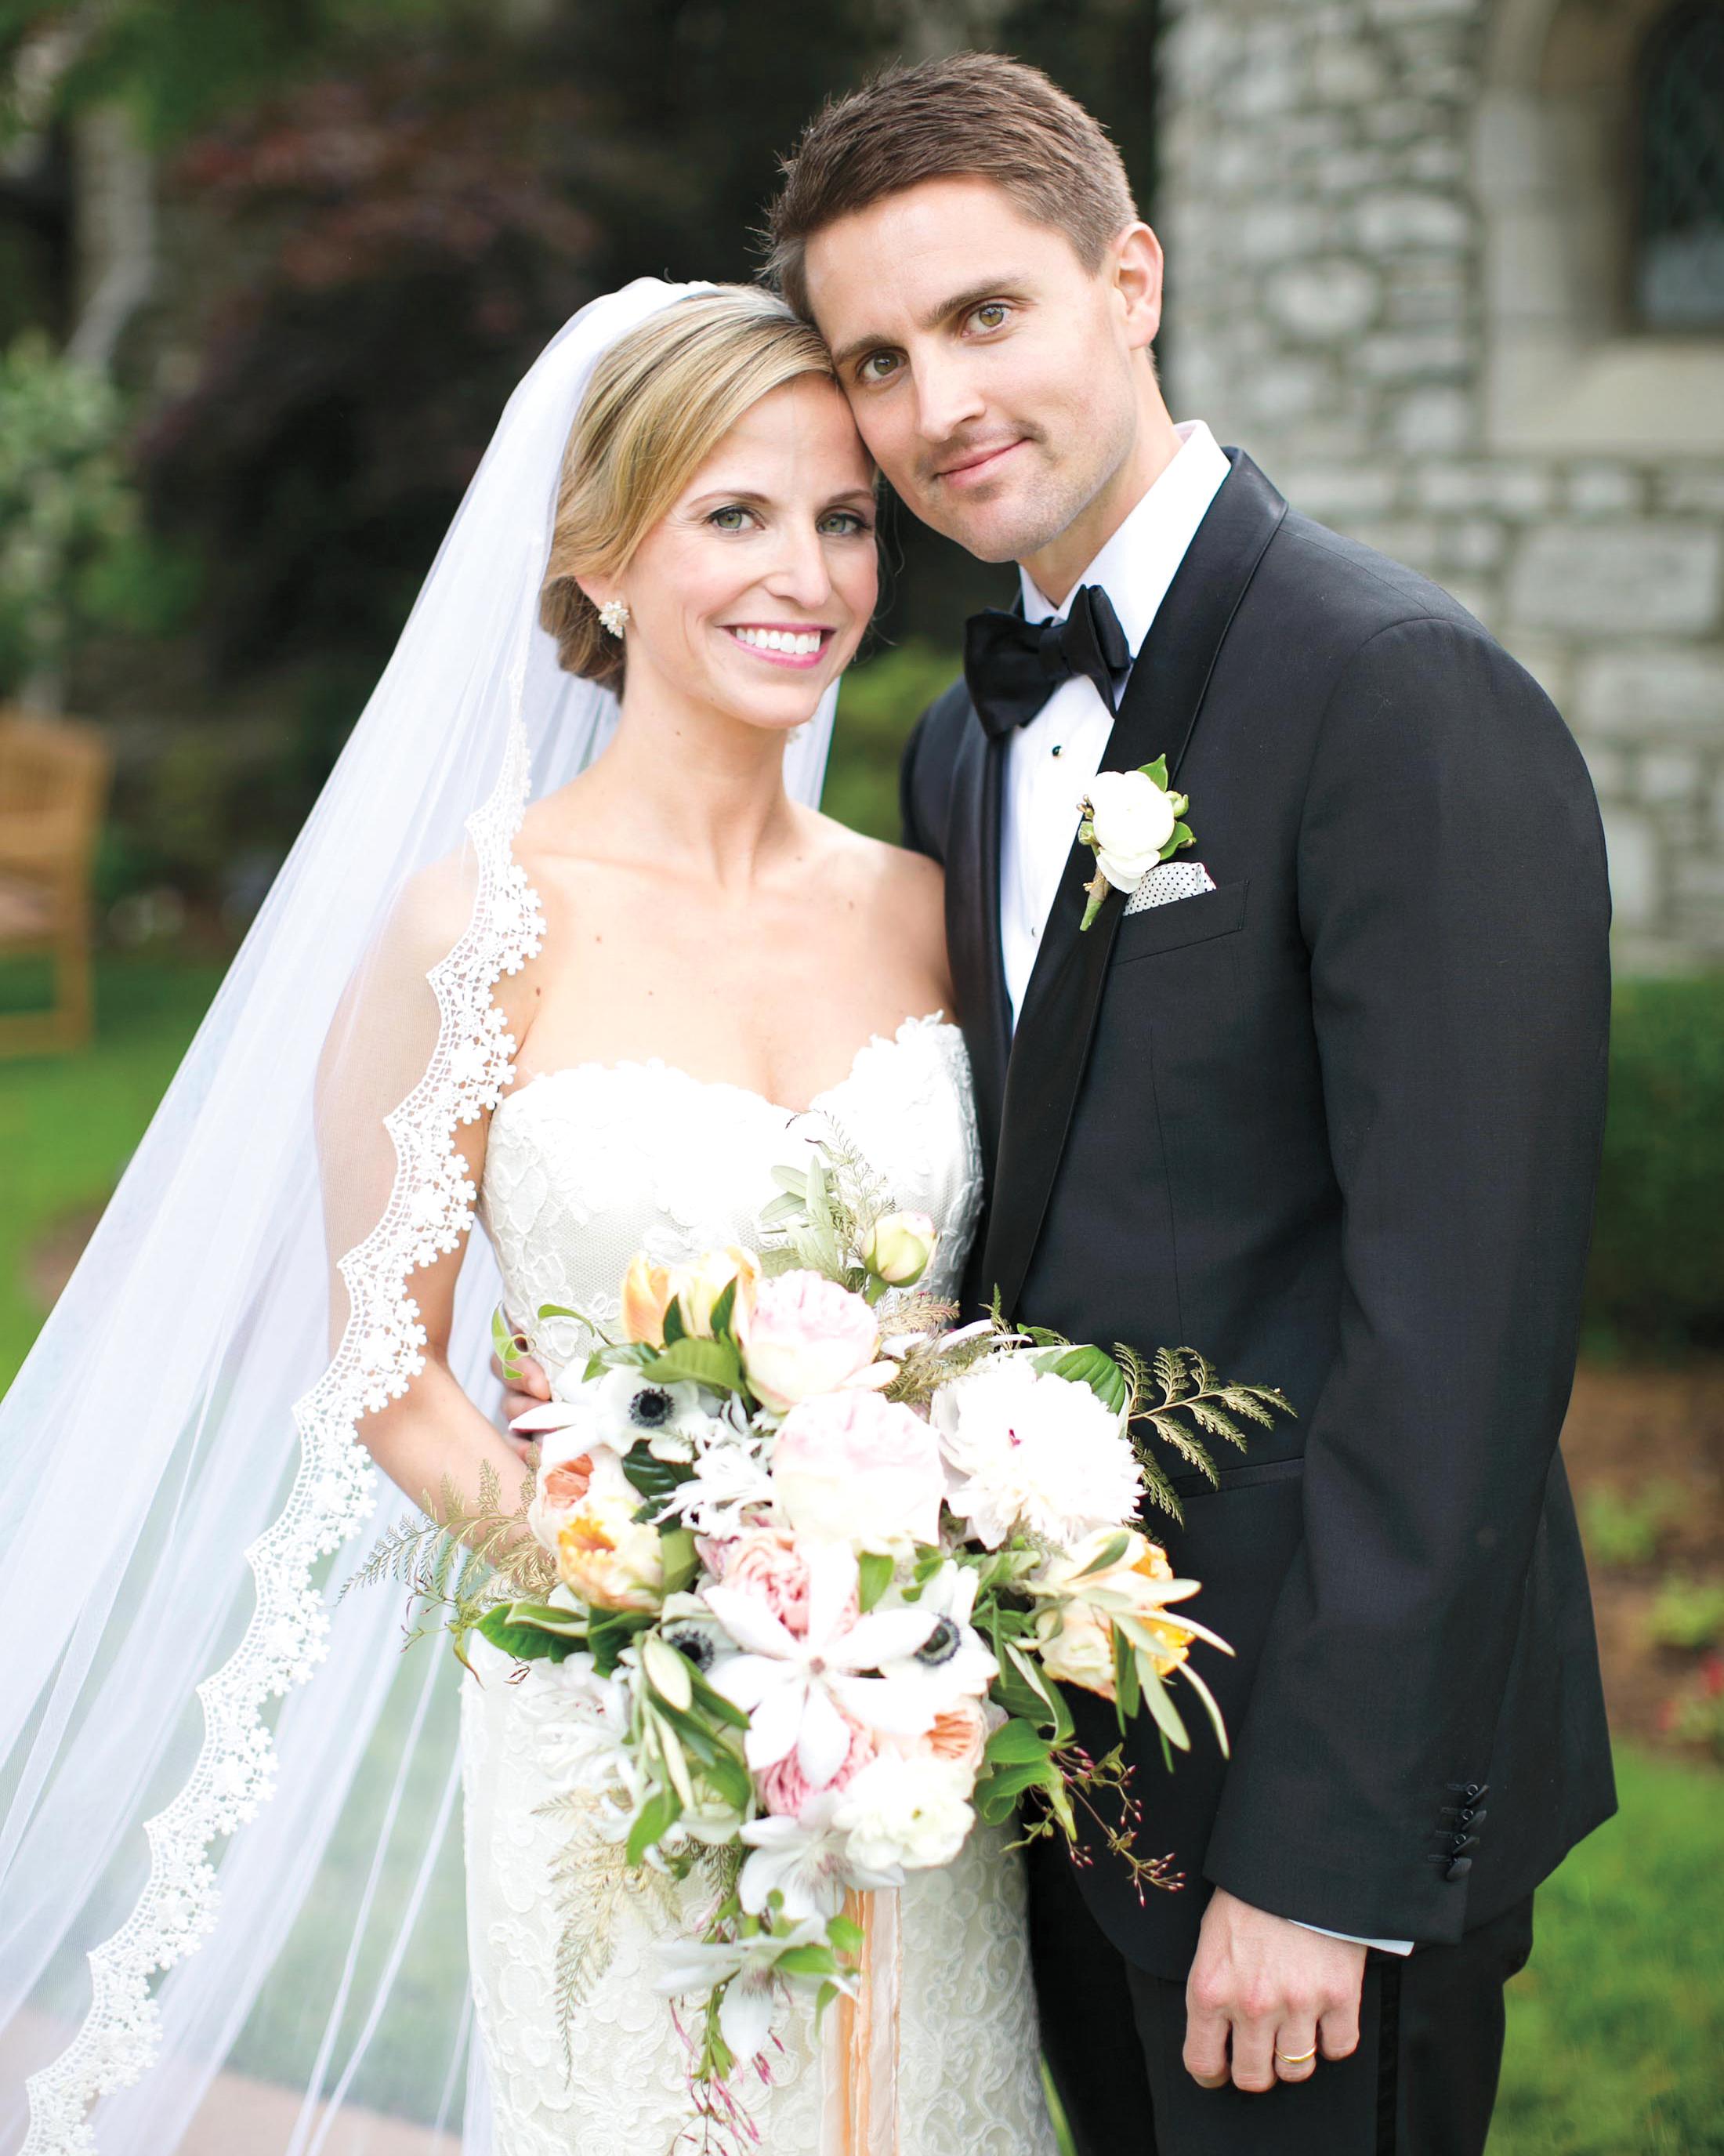 courtney-michael-bride-groom-31-s111677.jpg